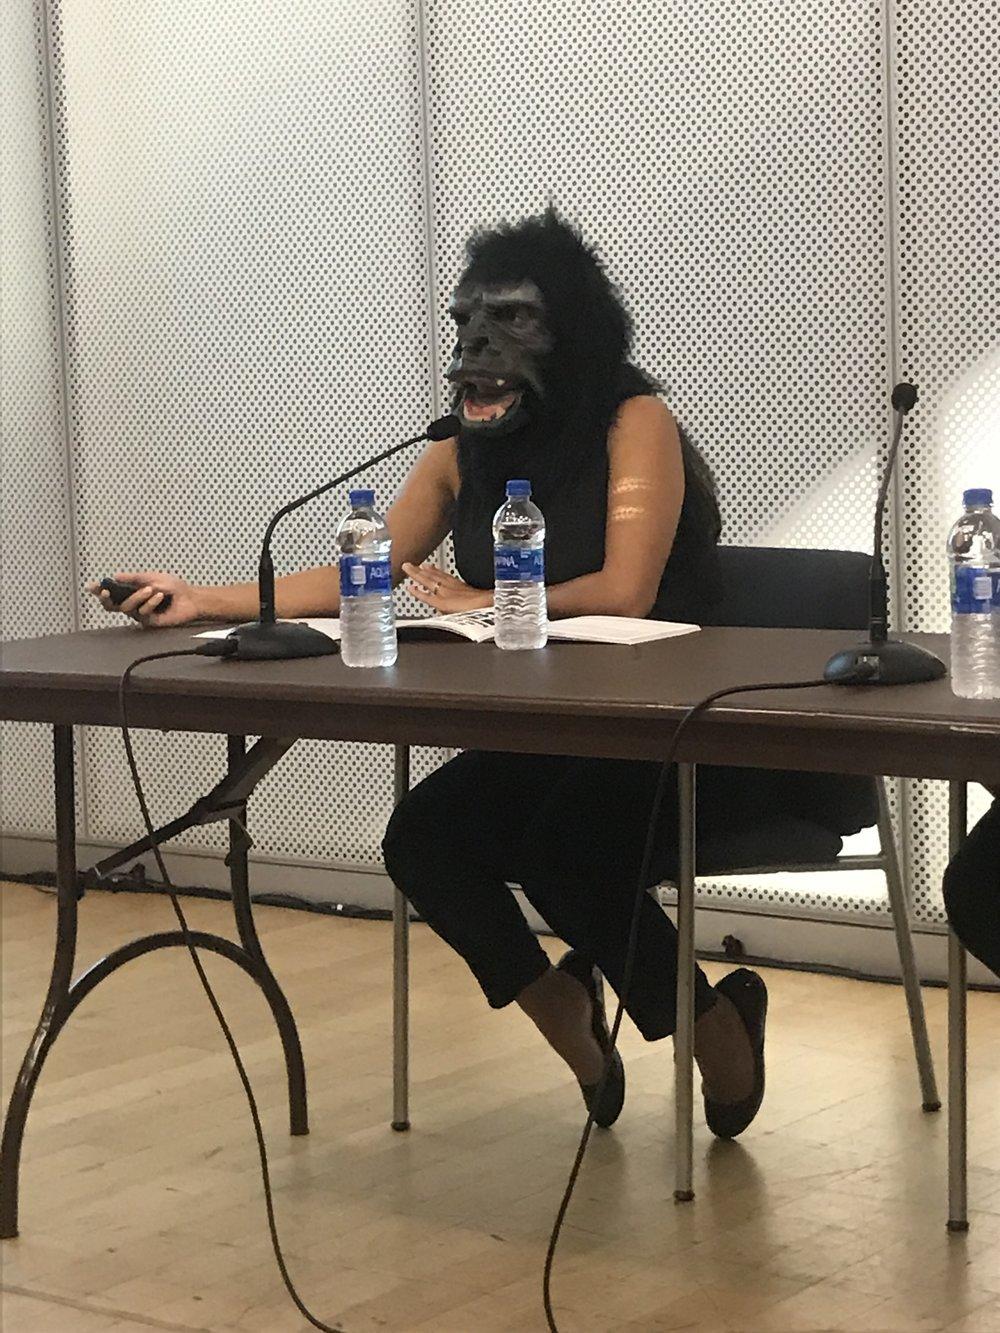 Zubeida Agha of Guerrilla Girls__The Un-Heroic Act_Symposium_Oct. 3 2018. Photo Monika Fabijanska